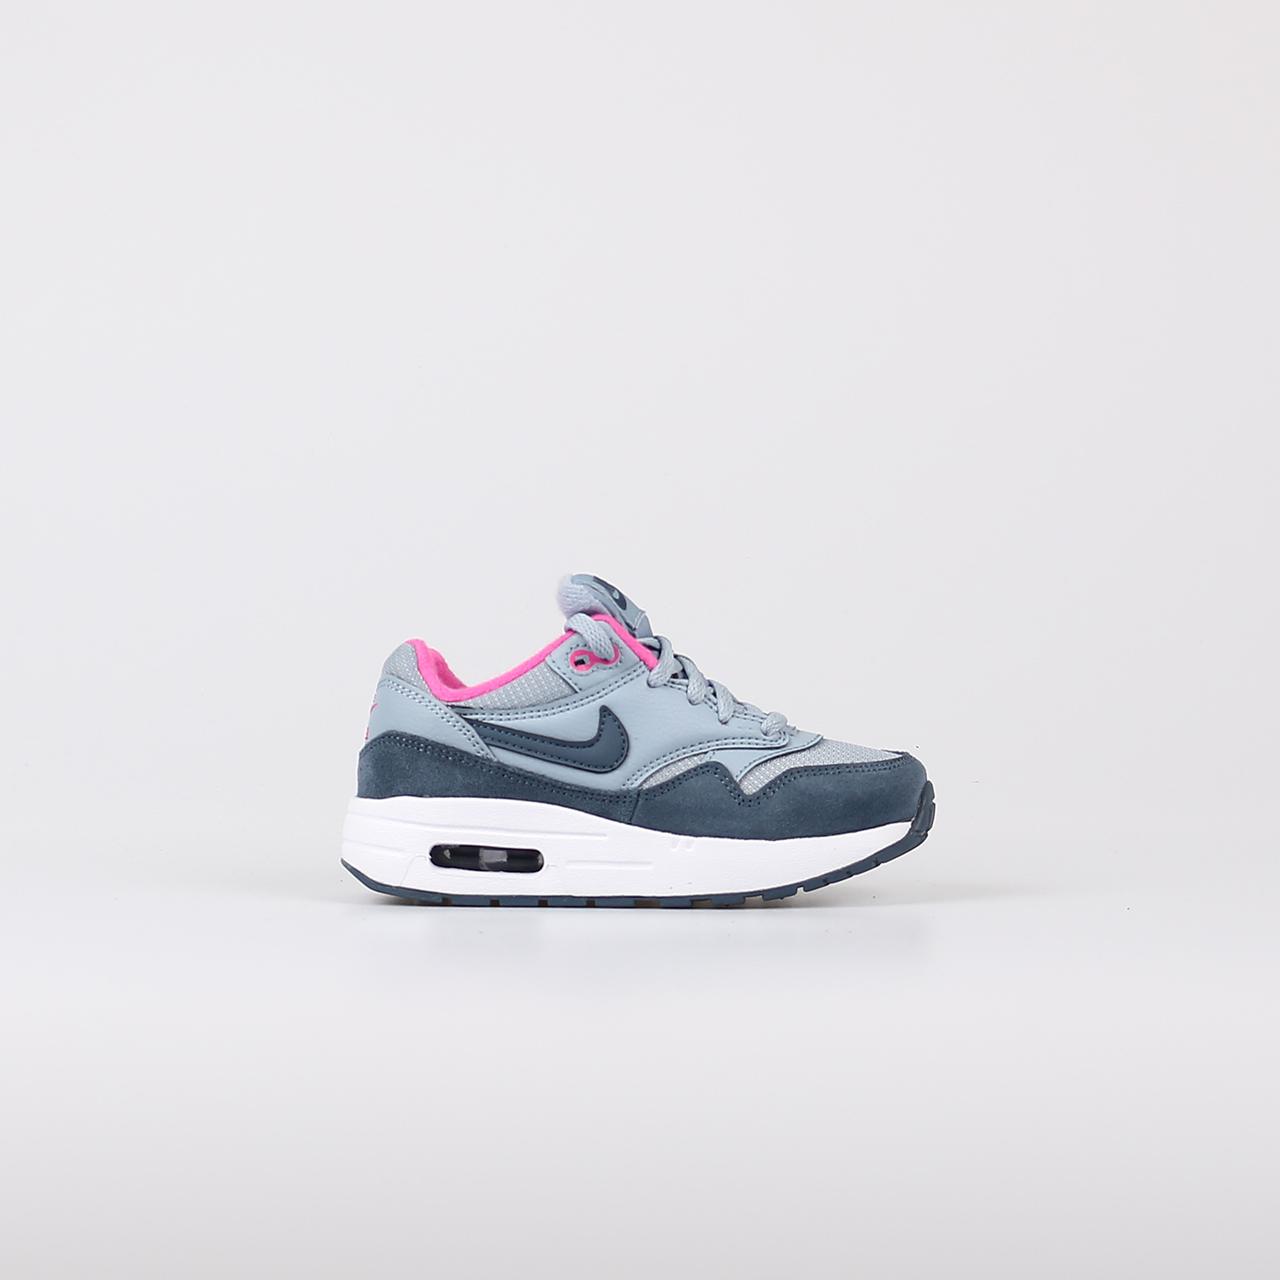 nike air max 1 ps sneakers kids blauw_35887.jpg – Collab